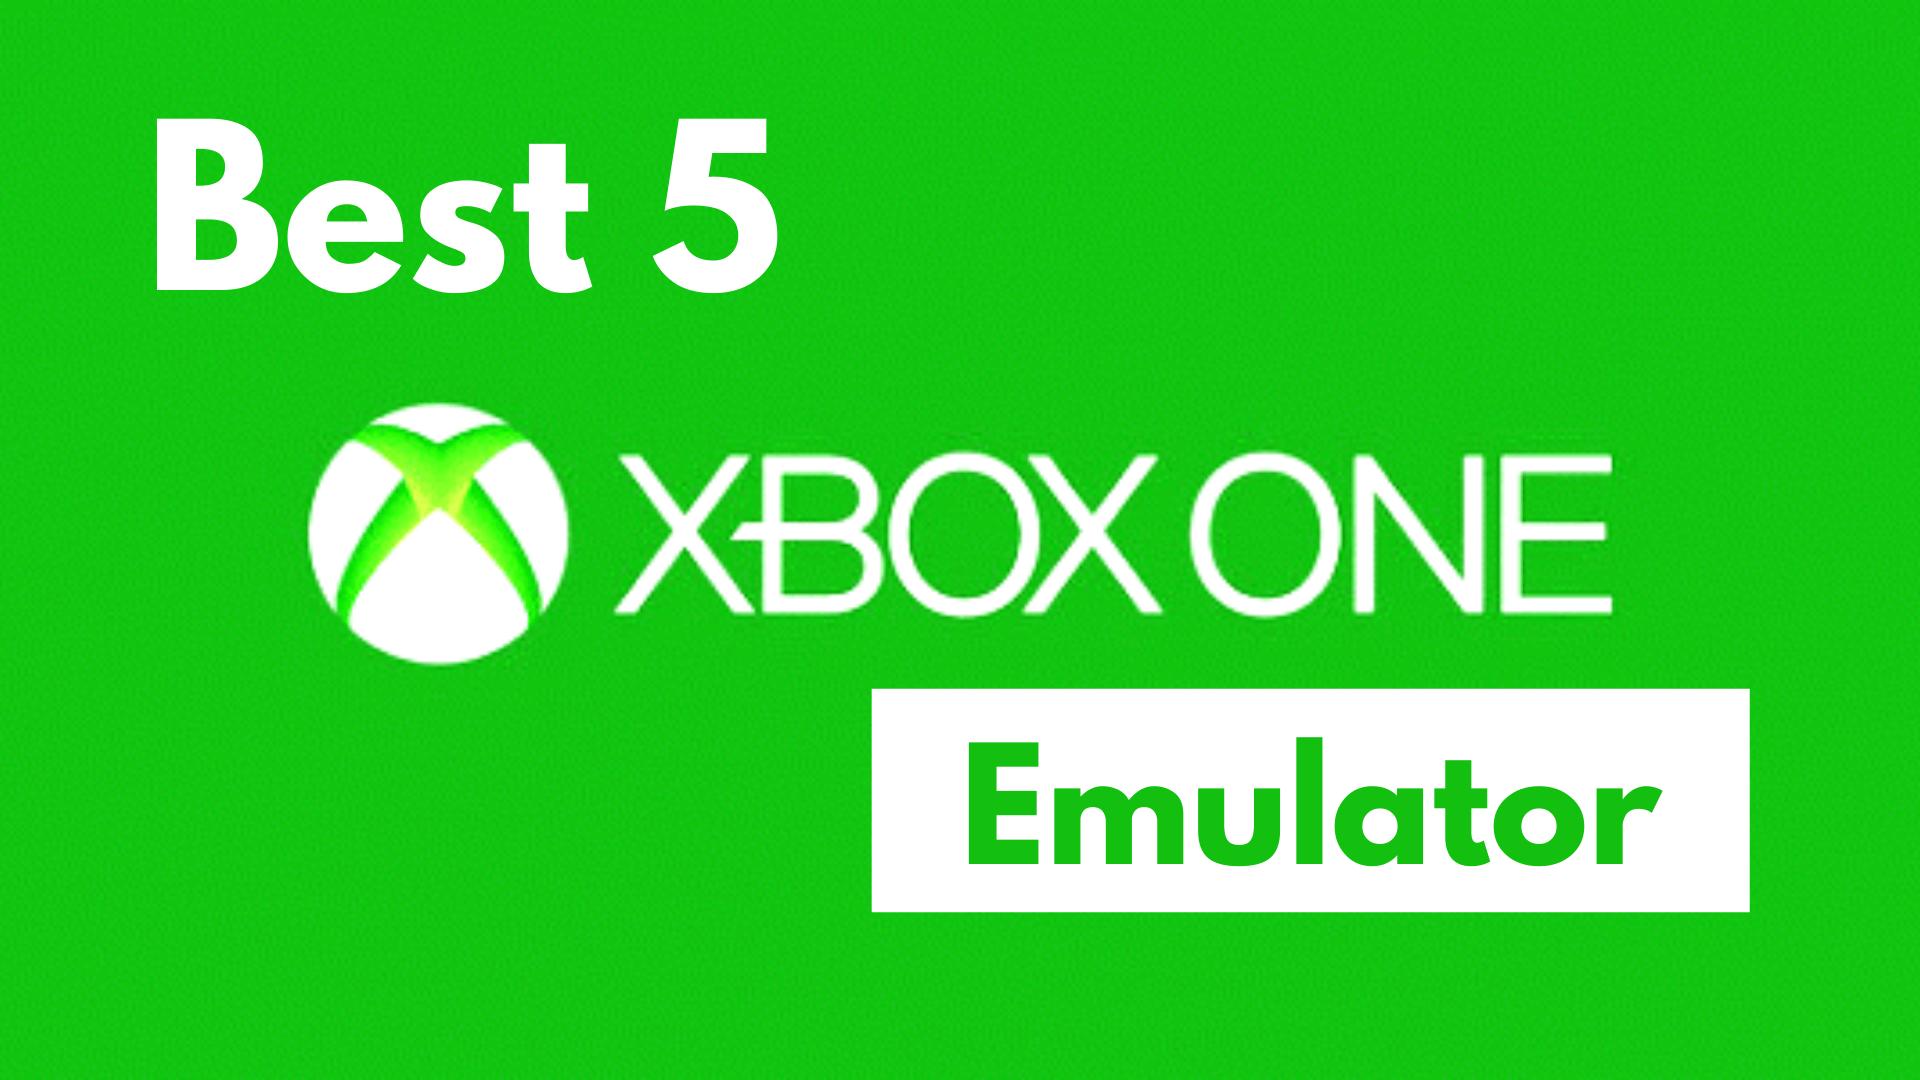 Xbox One Emulator PC